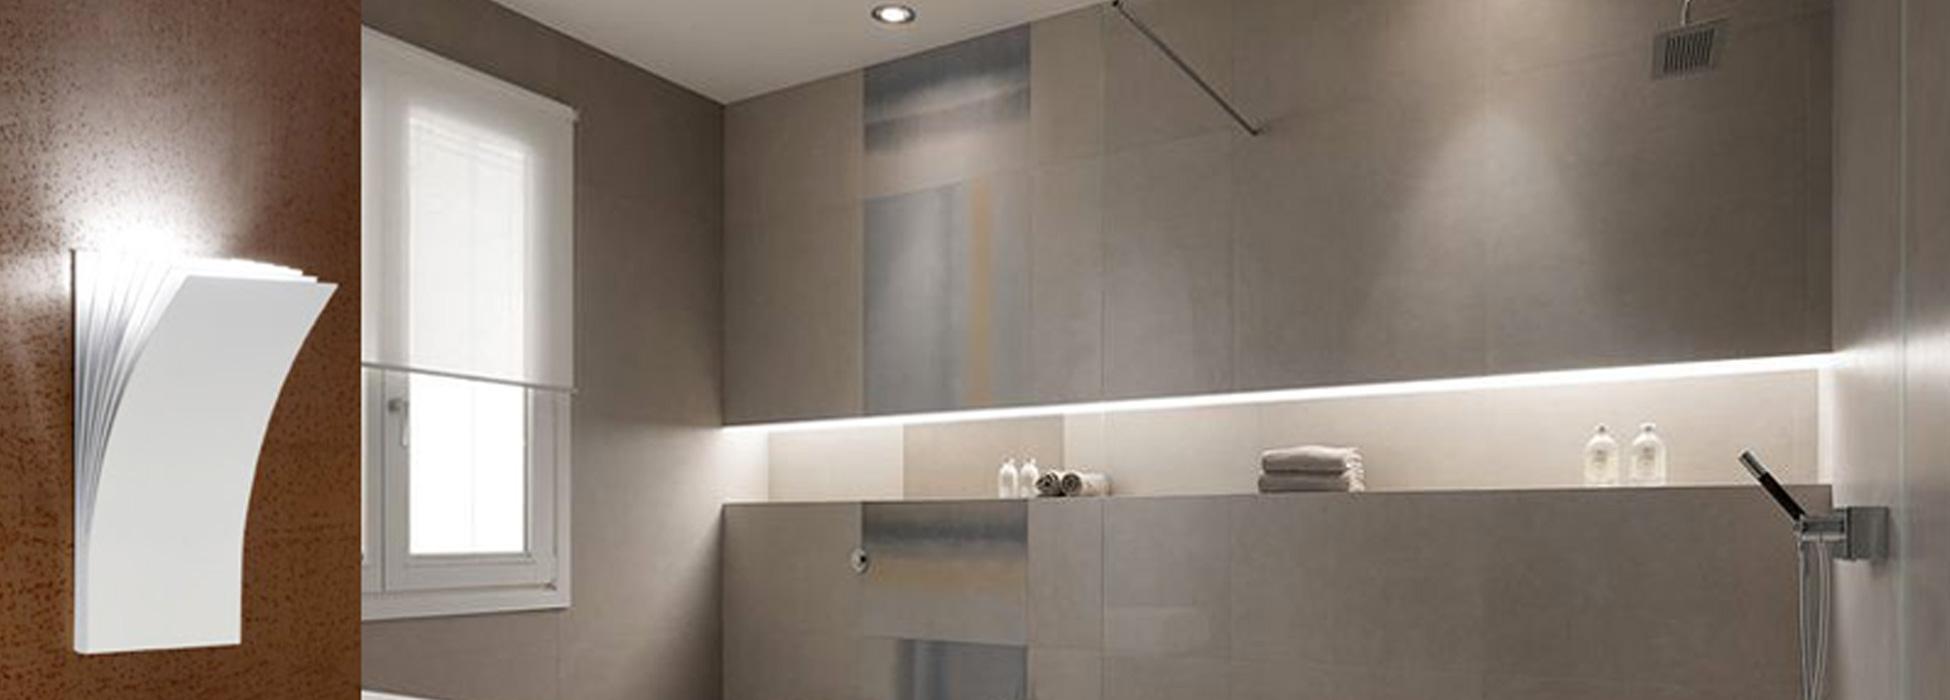 Illuminazione bagno led studio luce lampadari patern - Illuminazione bagno led ...